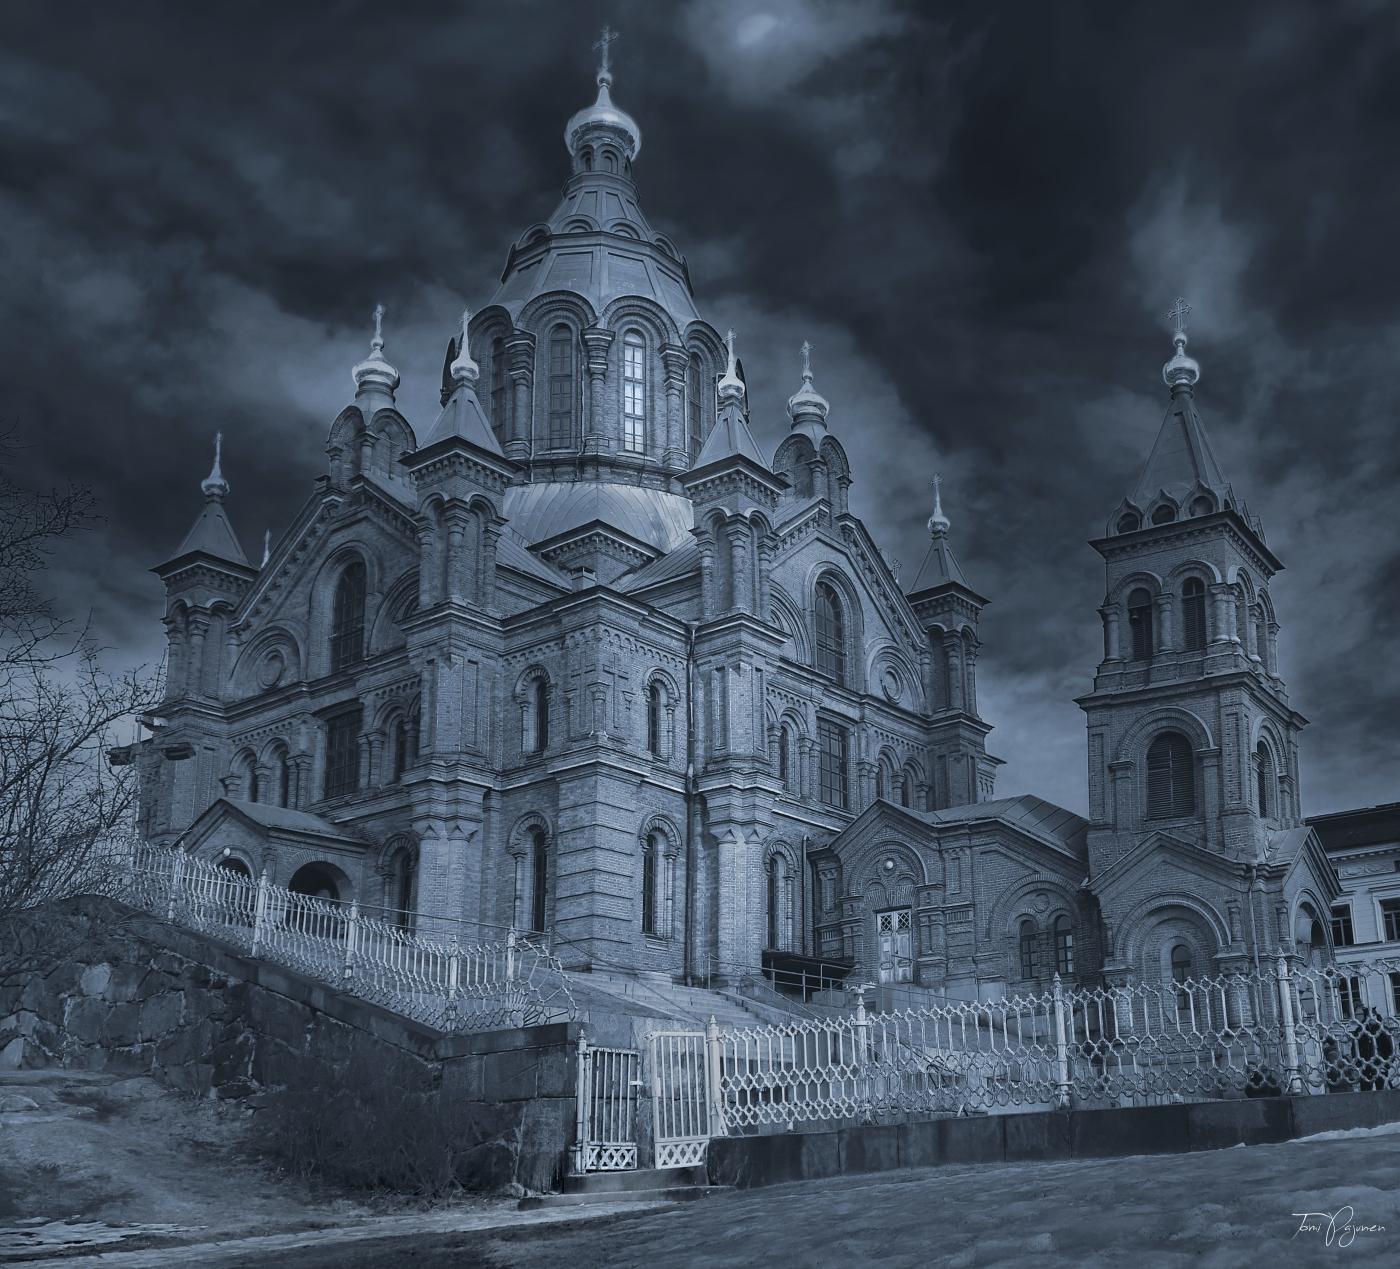 Dracula by Pajunen